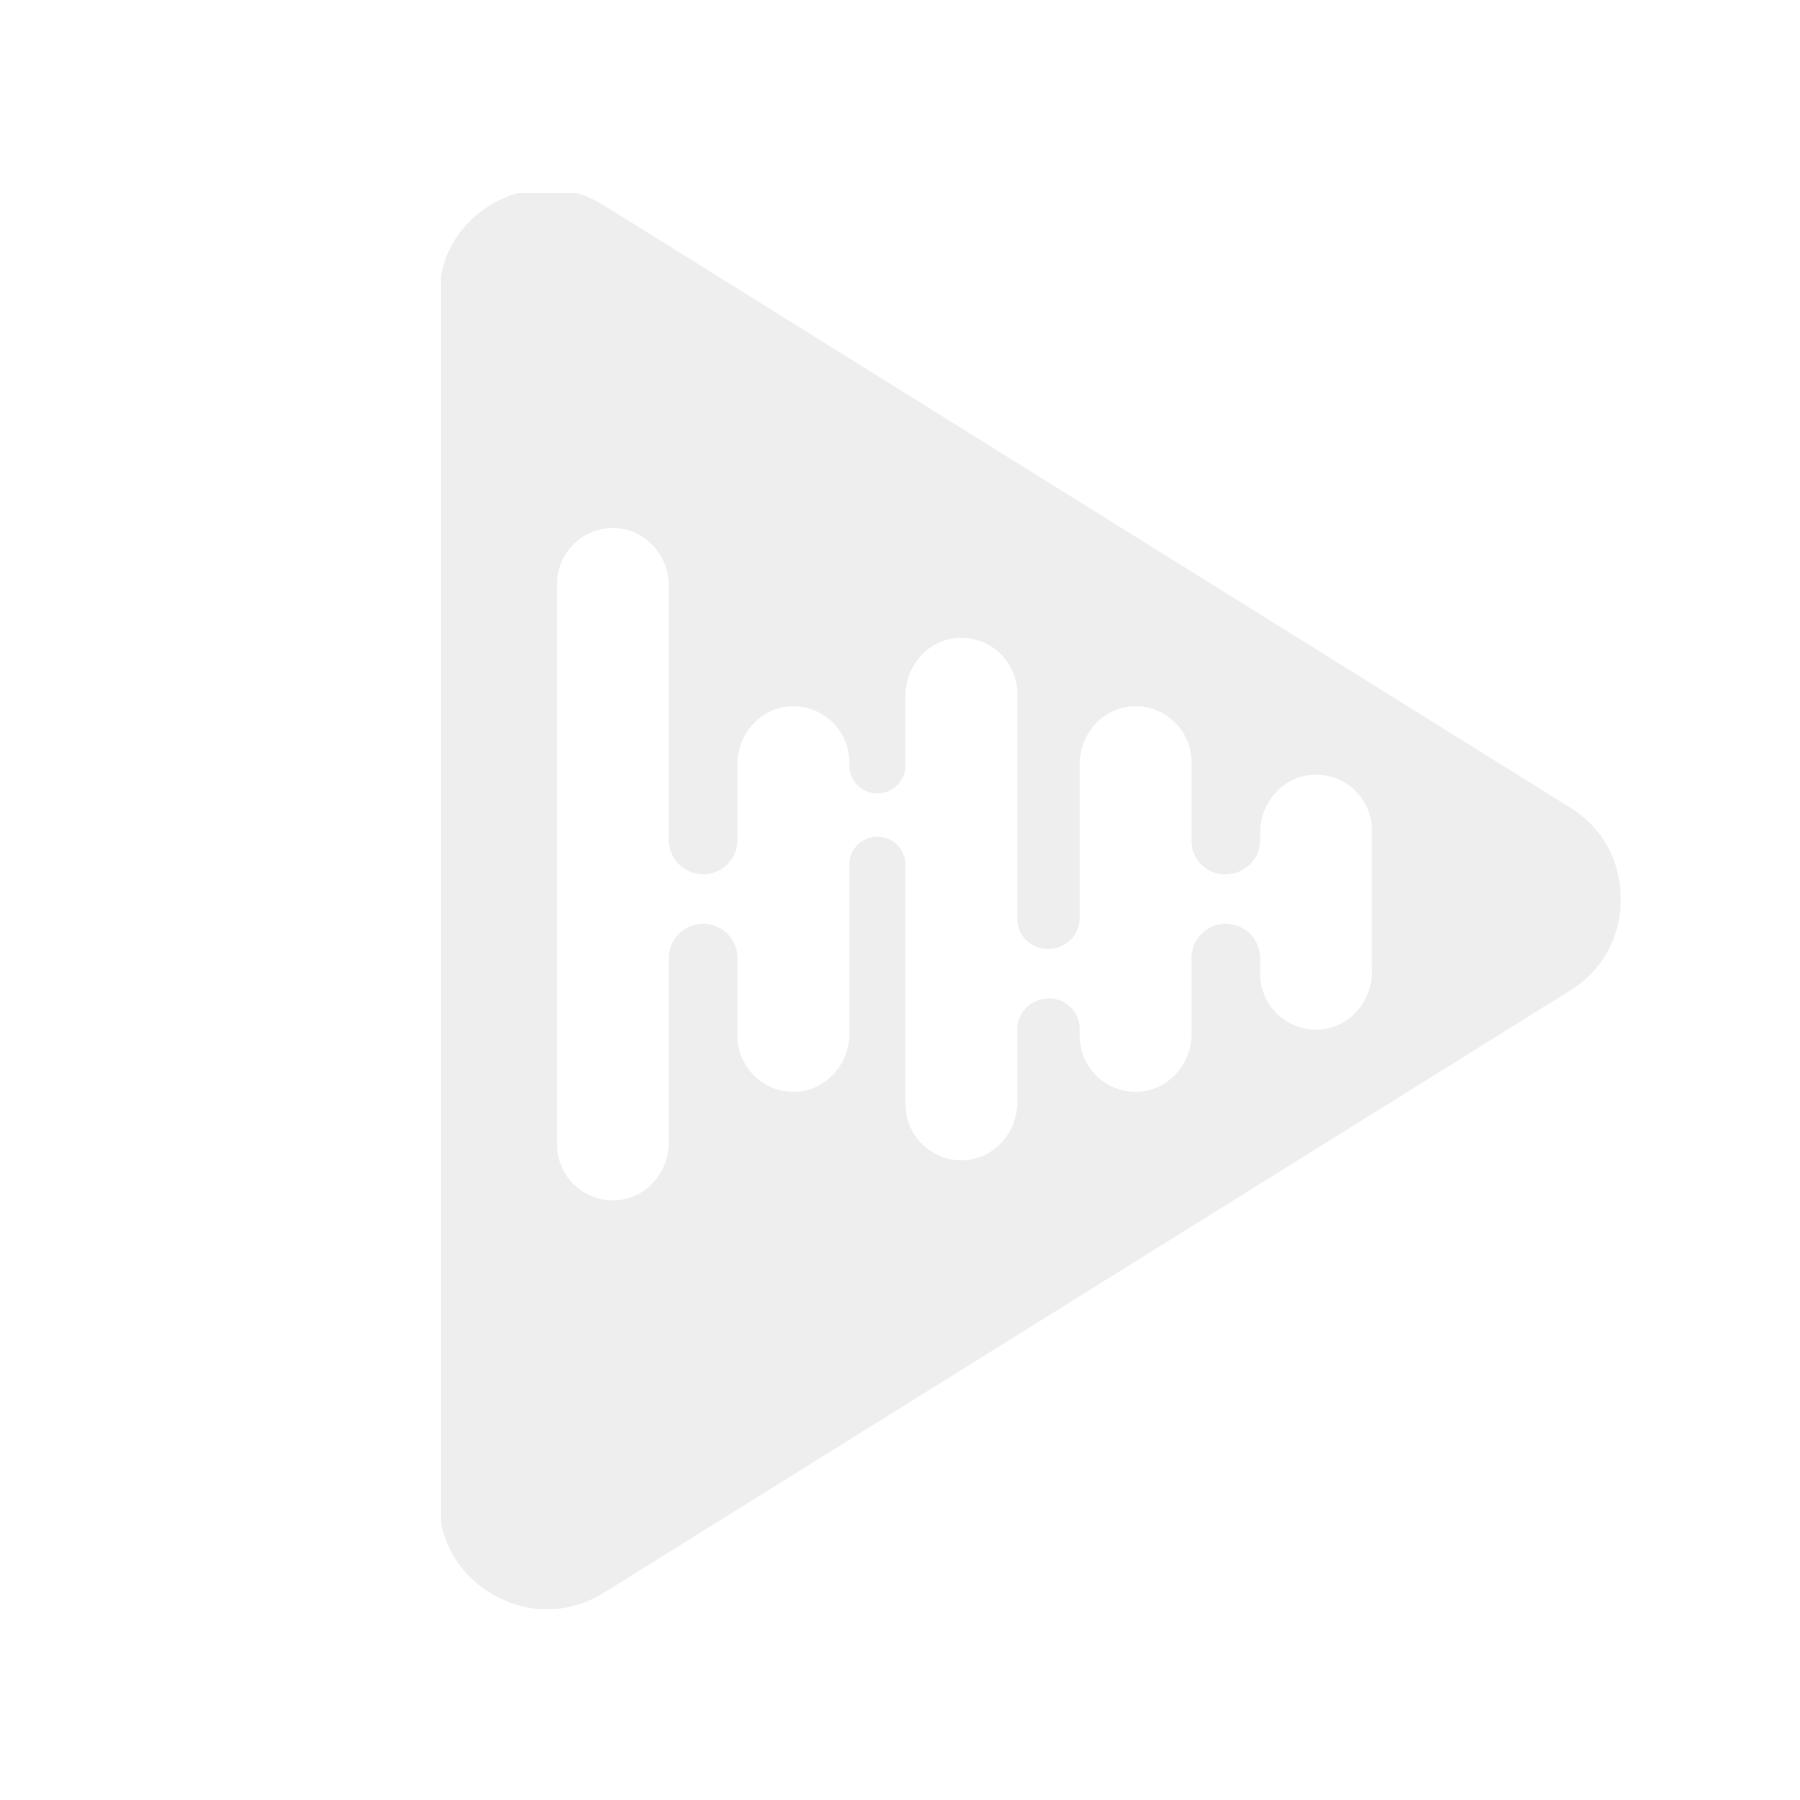 Audison AP8.9 BIT-AUDI1